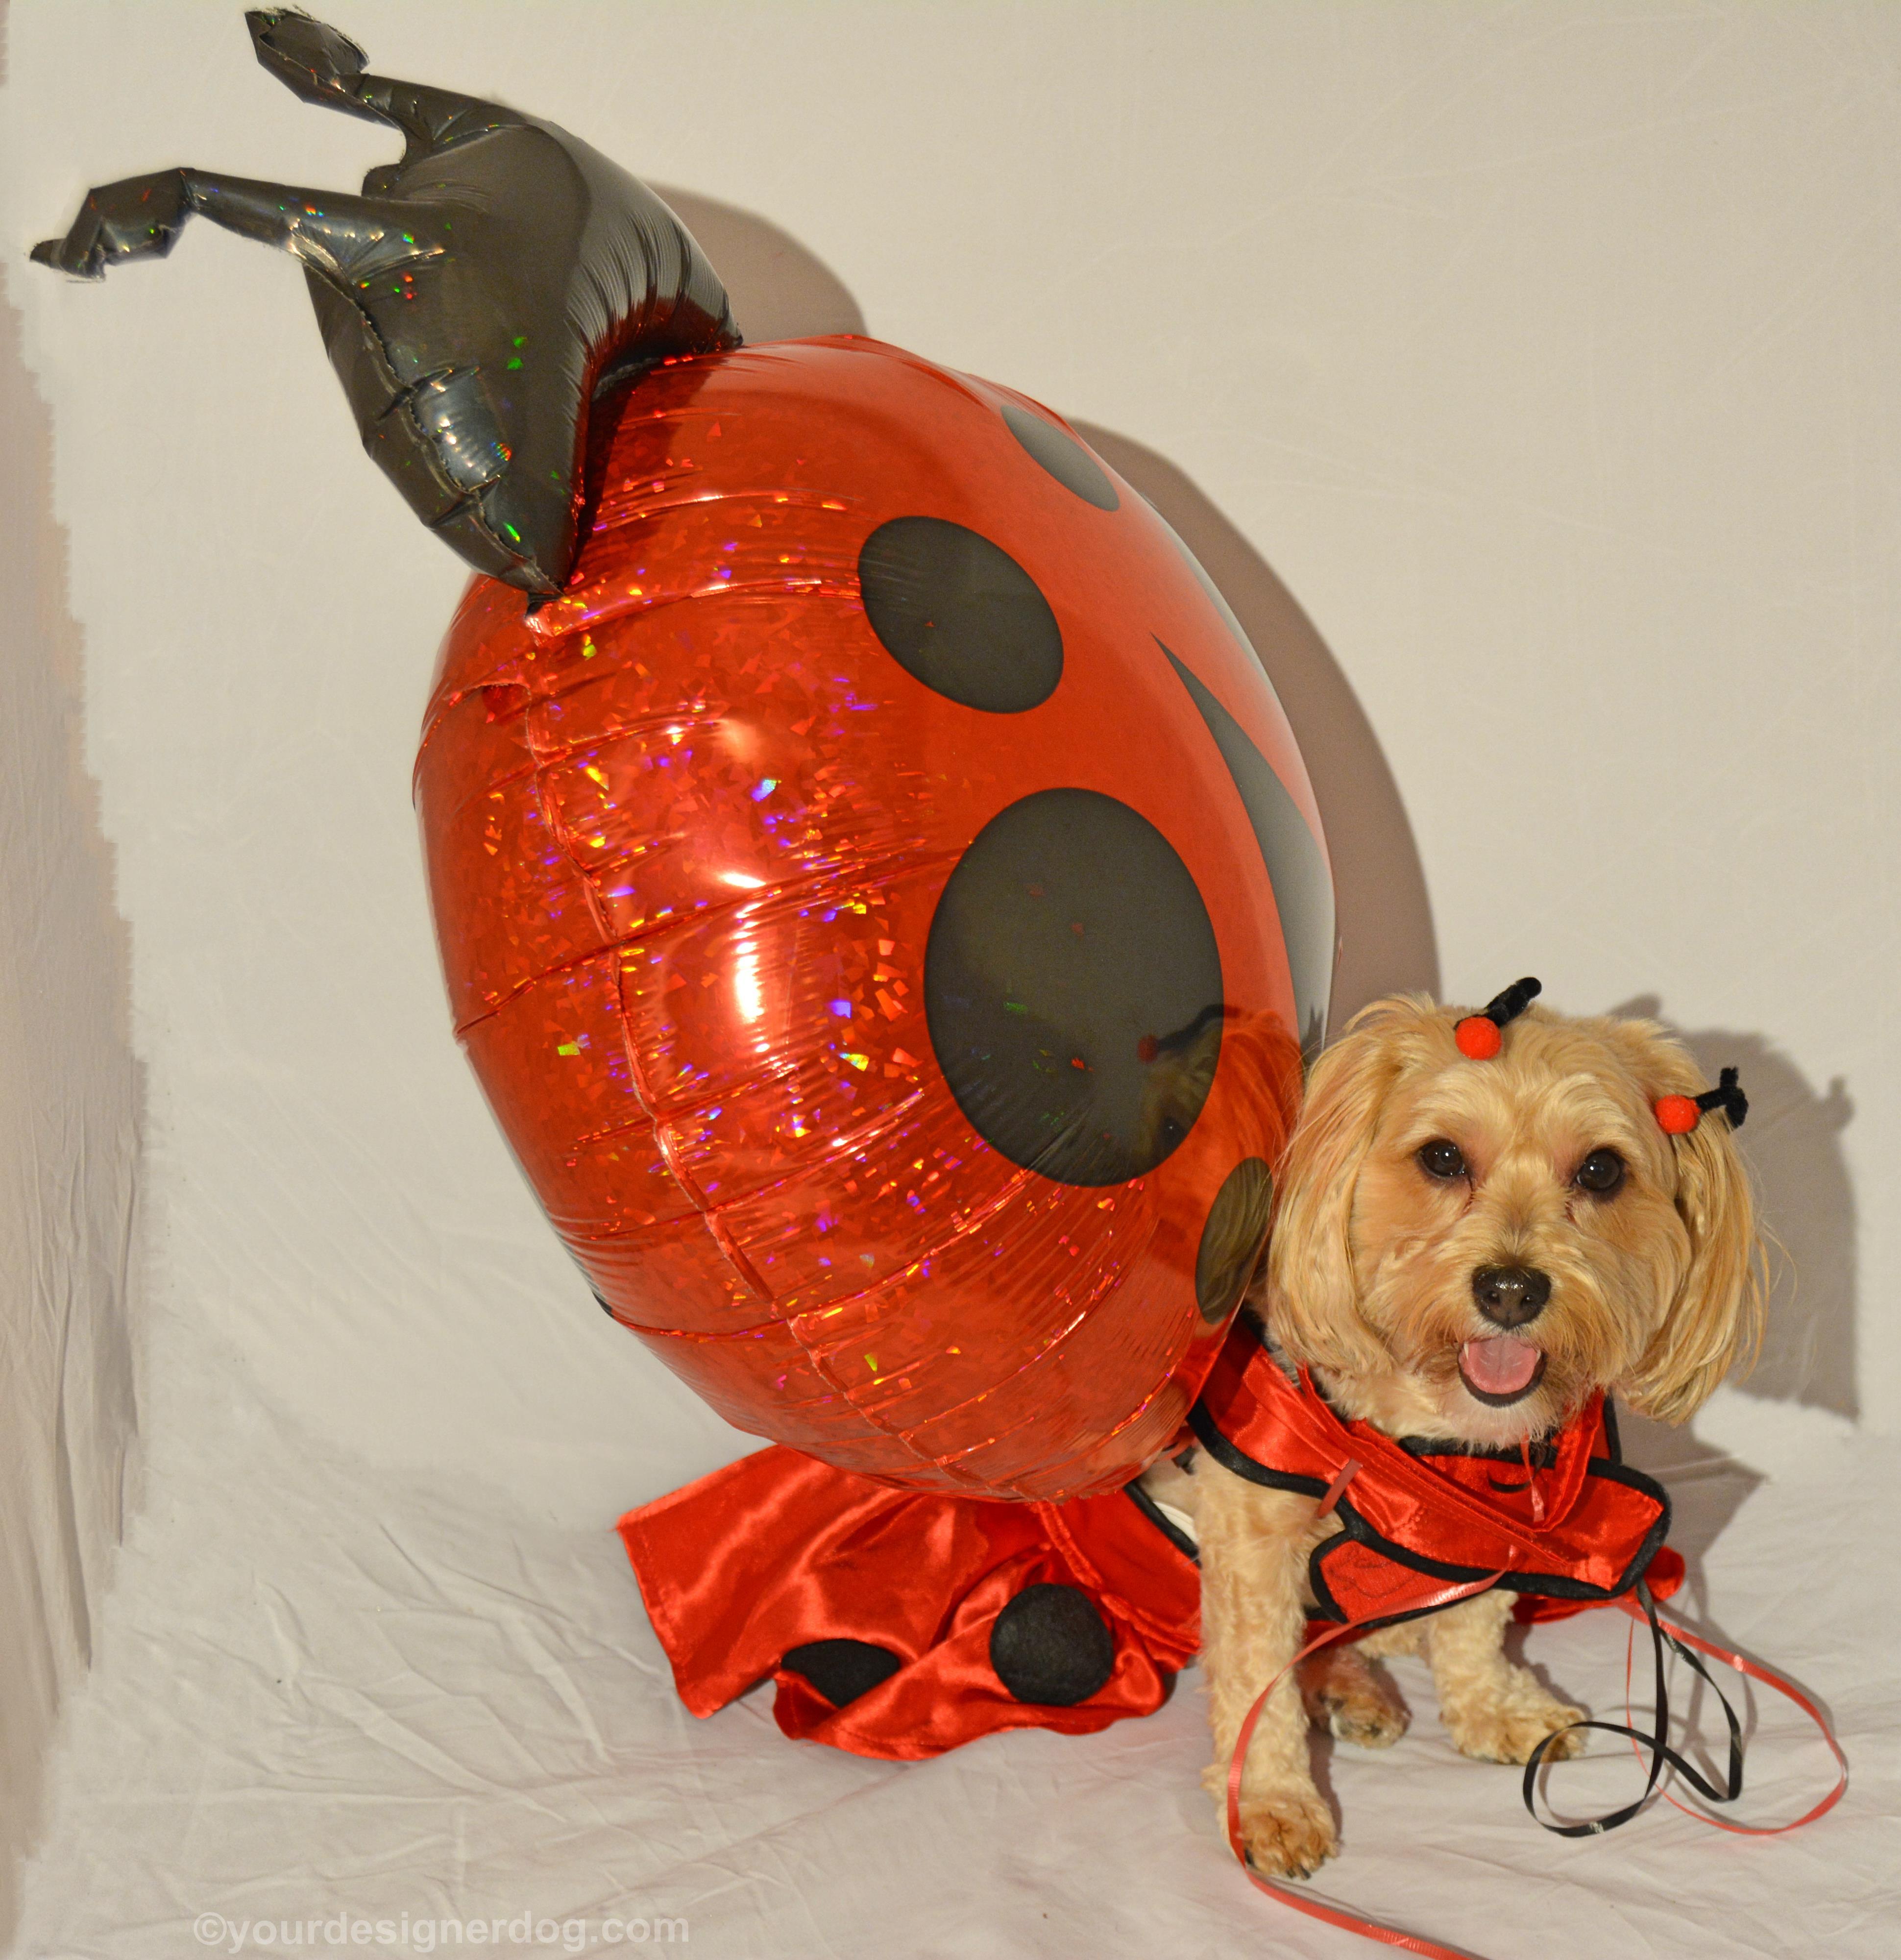 dogs, designer dogs, Yorkipoo, yorkie poo, lady bug, dog costume, balloon